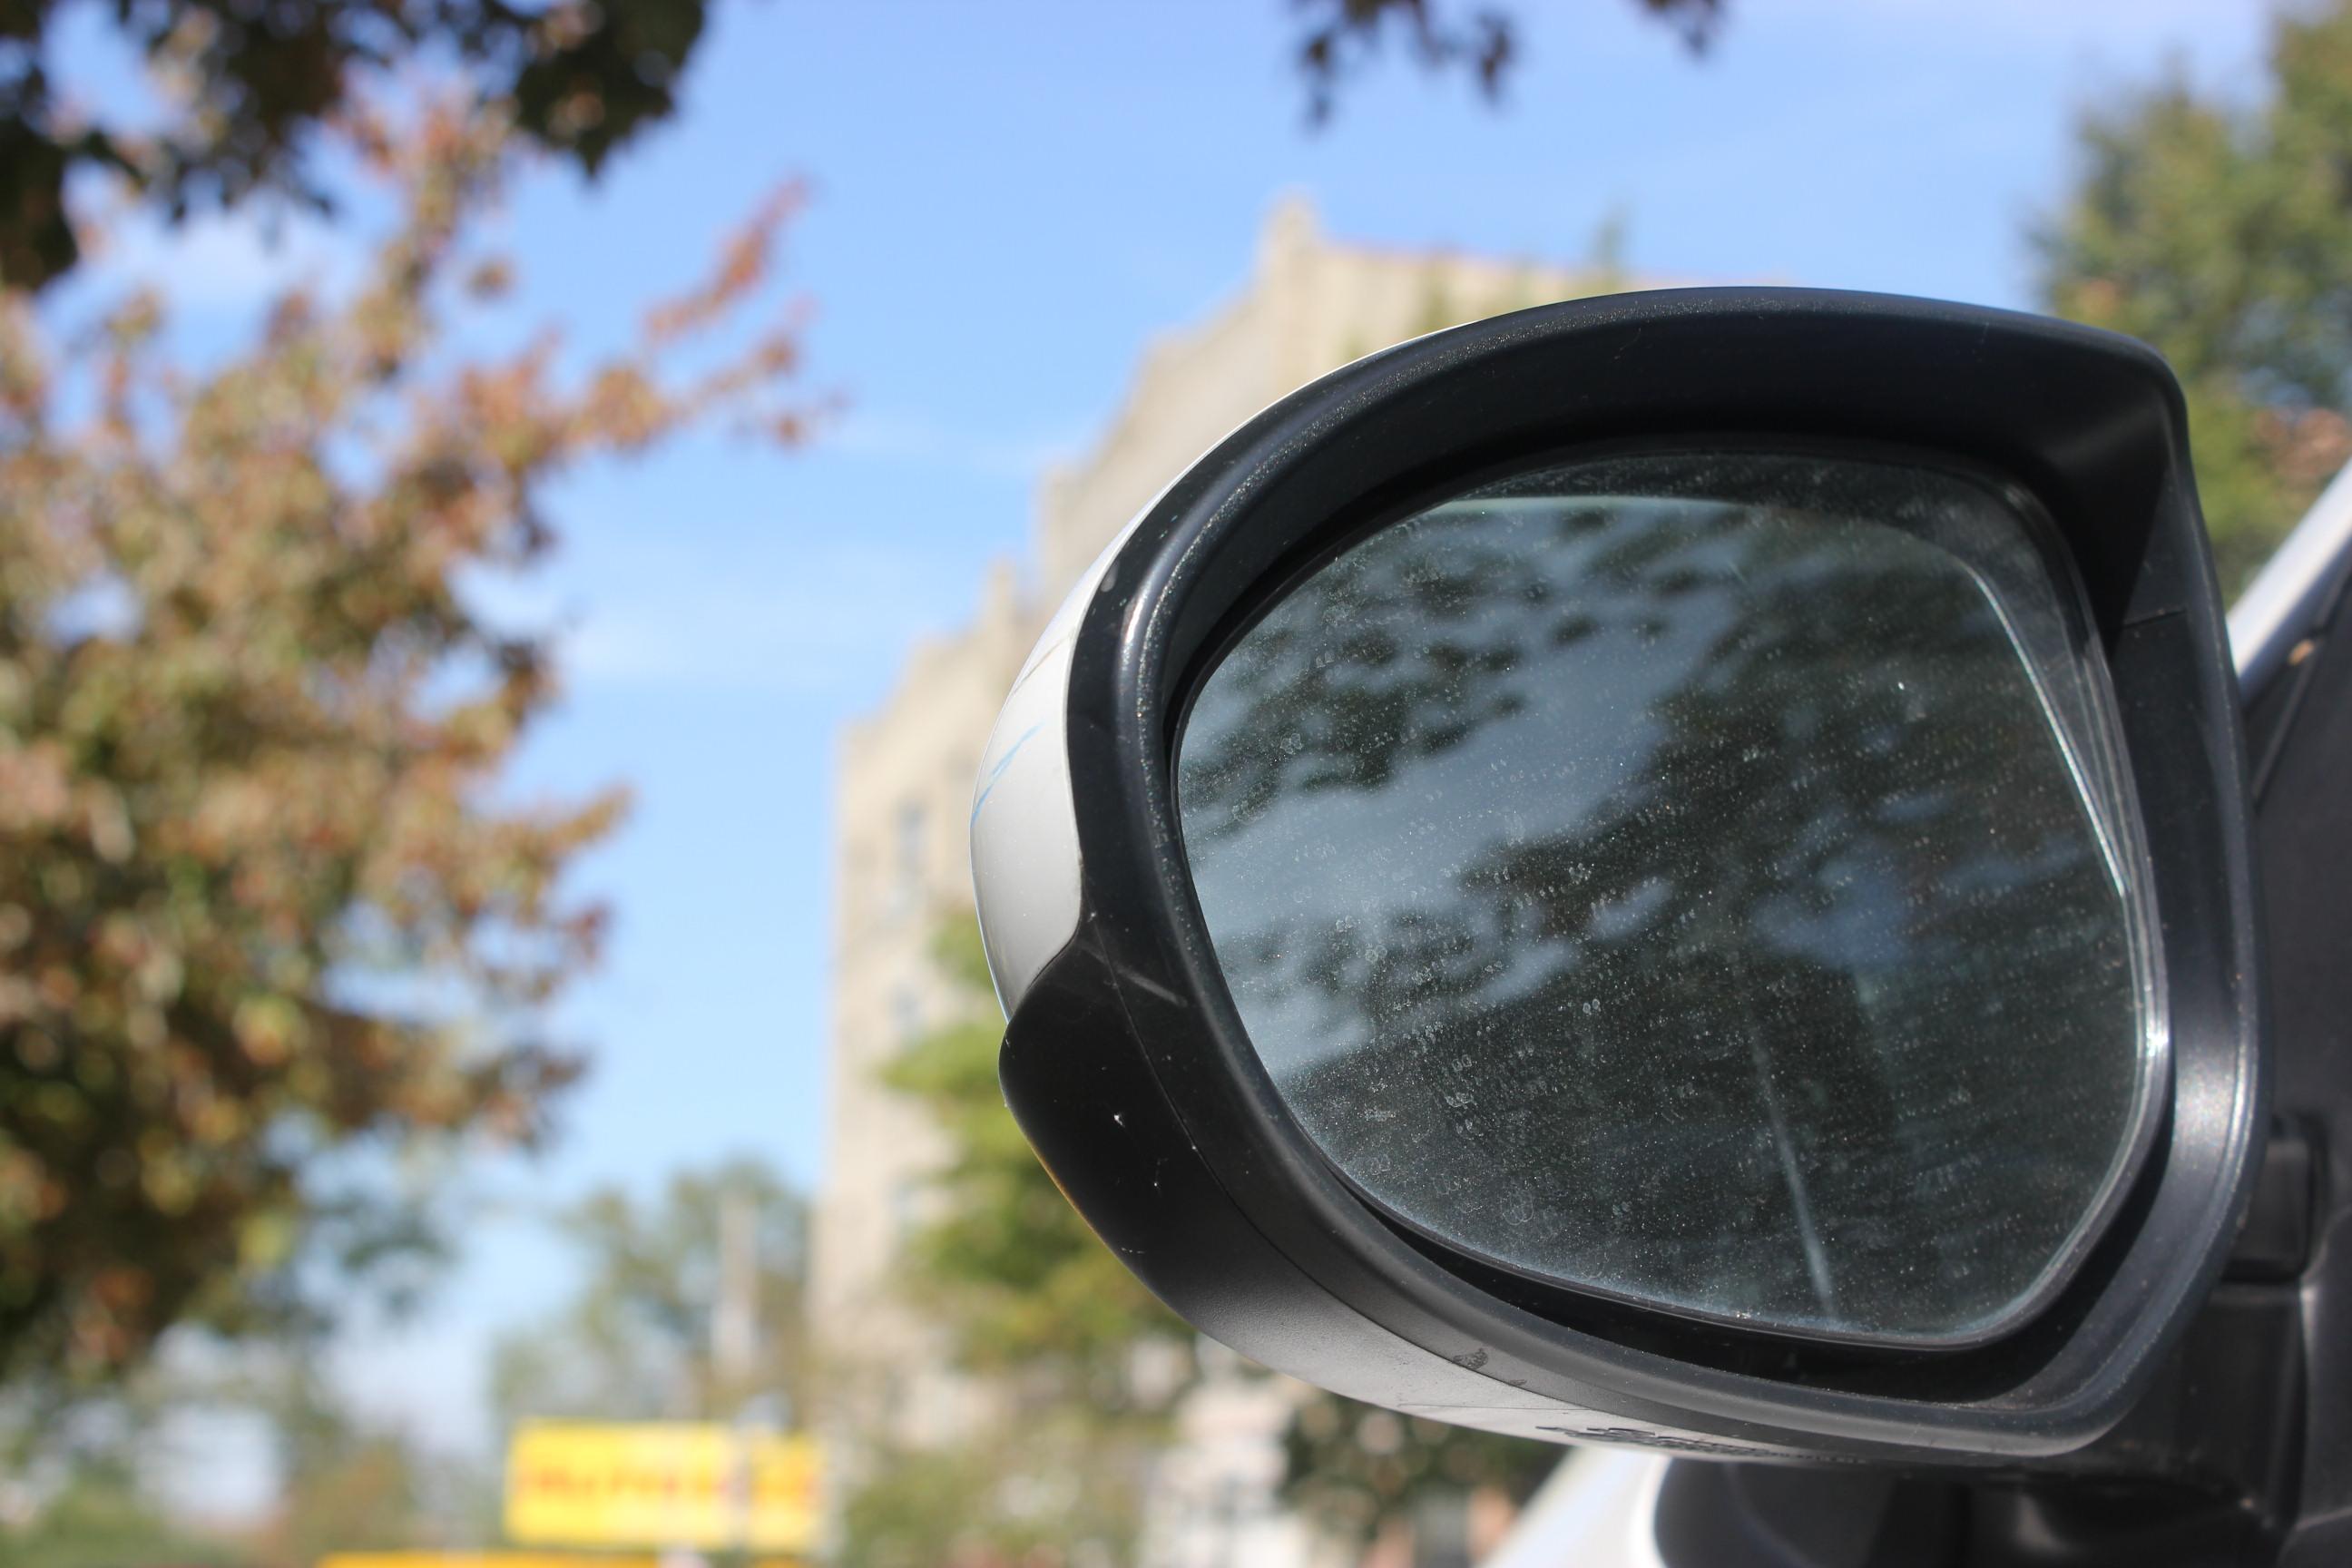 Mirror thefts vex Hunts Point drivers